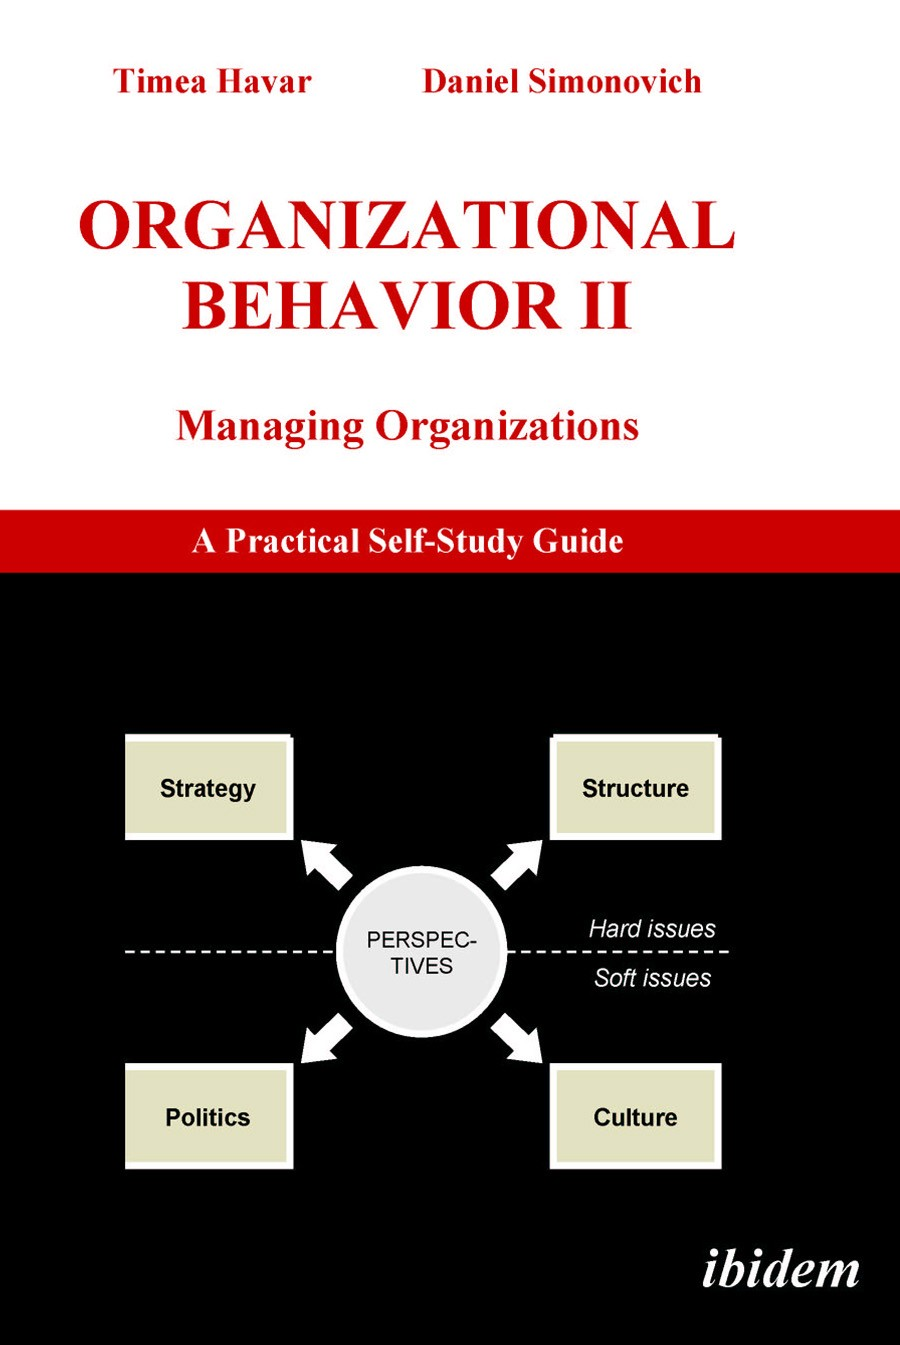 Organizational Behavior II